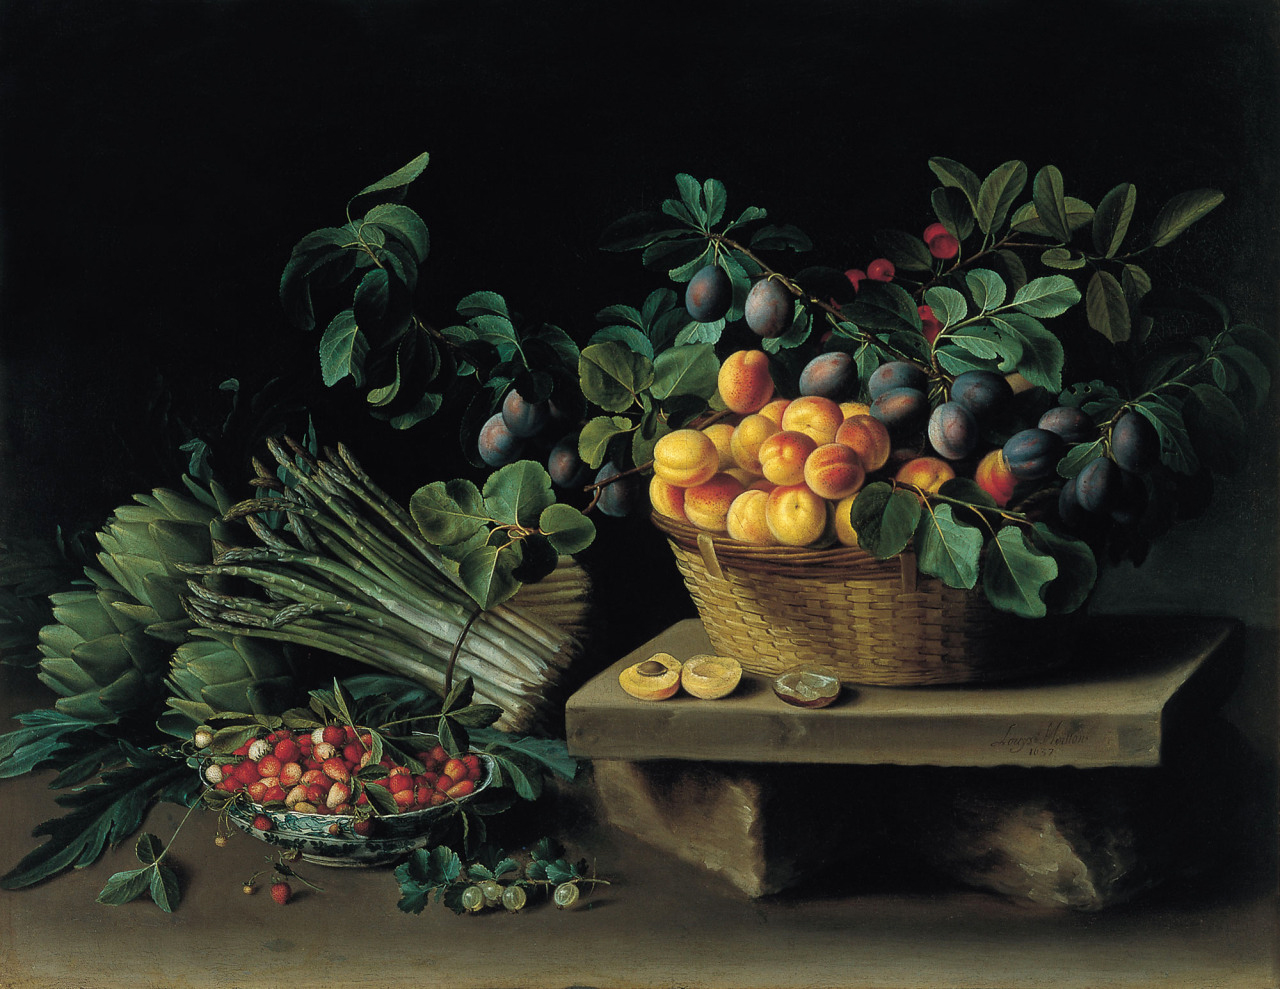 Художник Louise Moillon Натюрморт с фруктами краски природы Альберт Сафиуллин